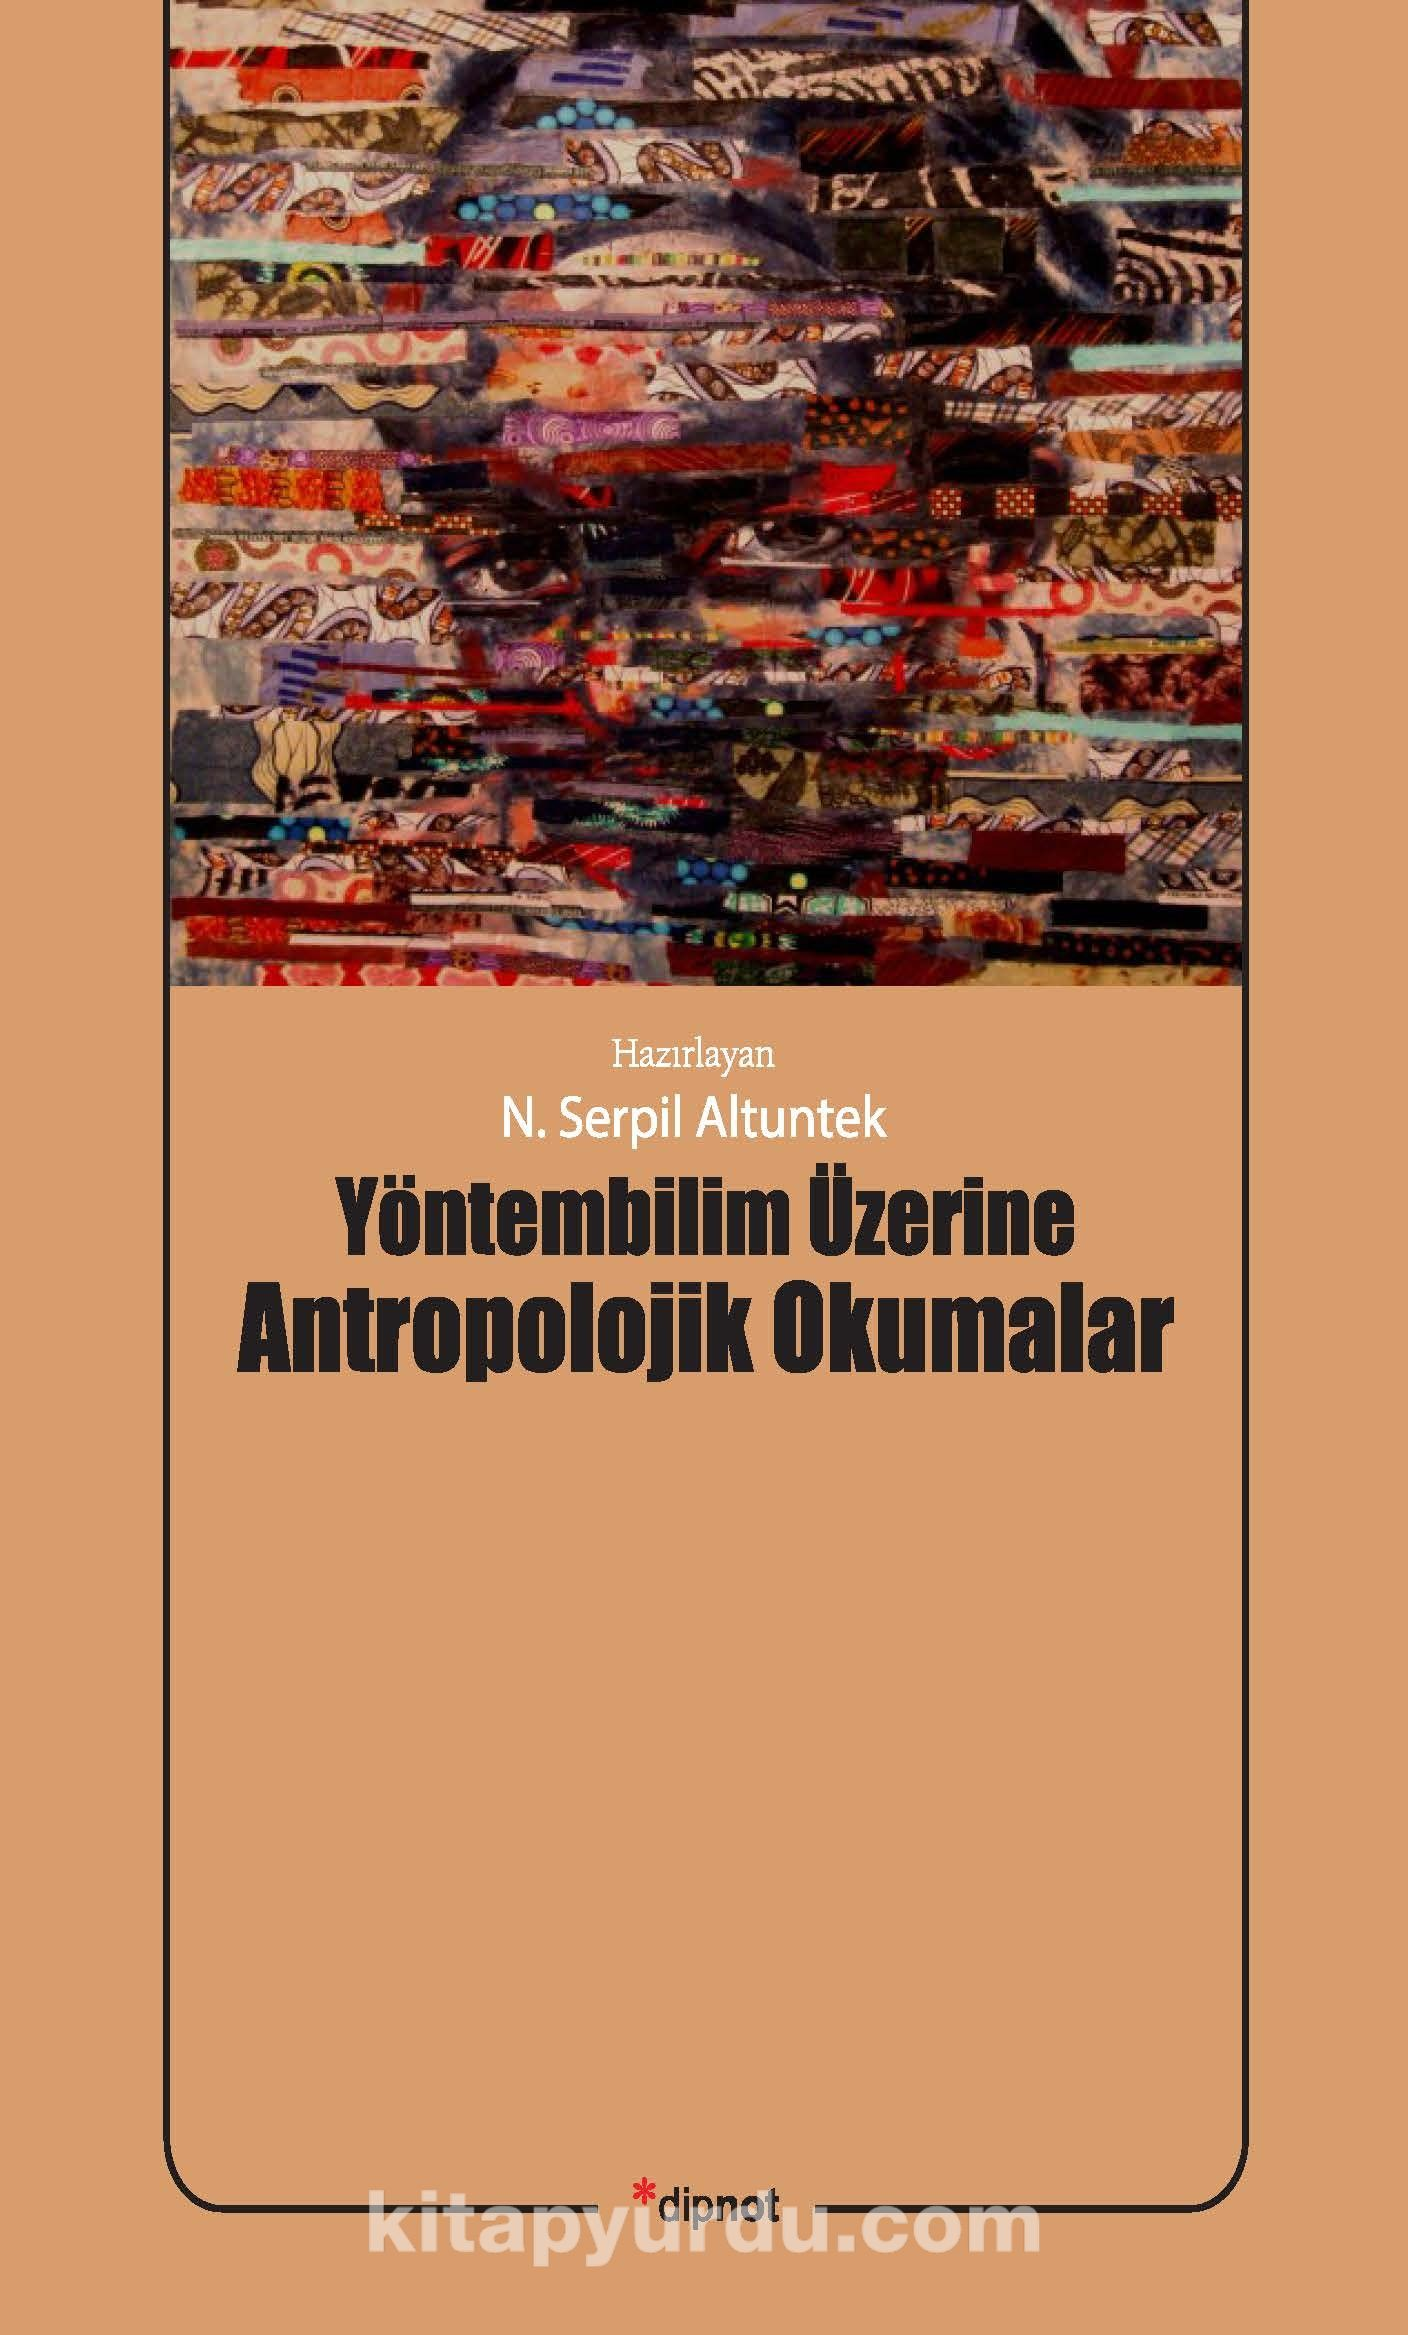 Yöntembilim Üzerine Antropolojik Okumalar - N. Serpil Altuntek pdf epub